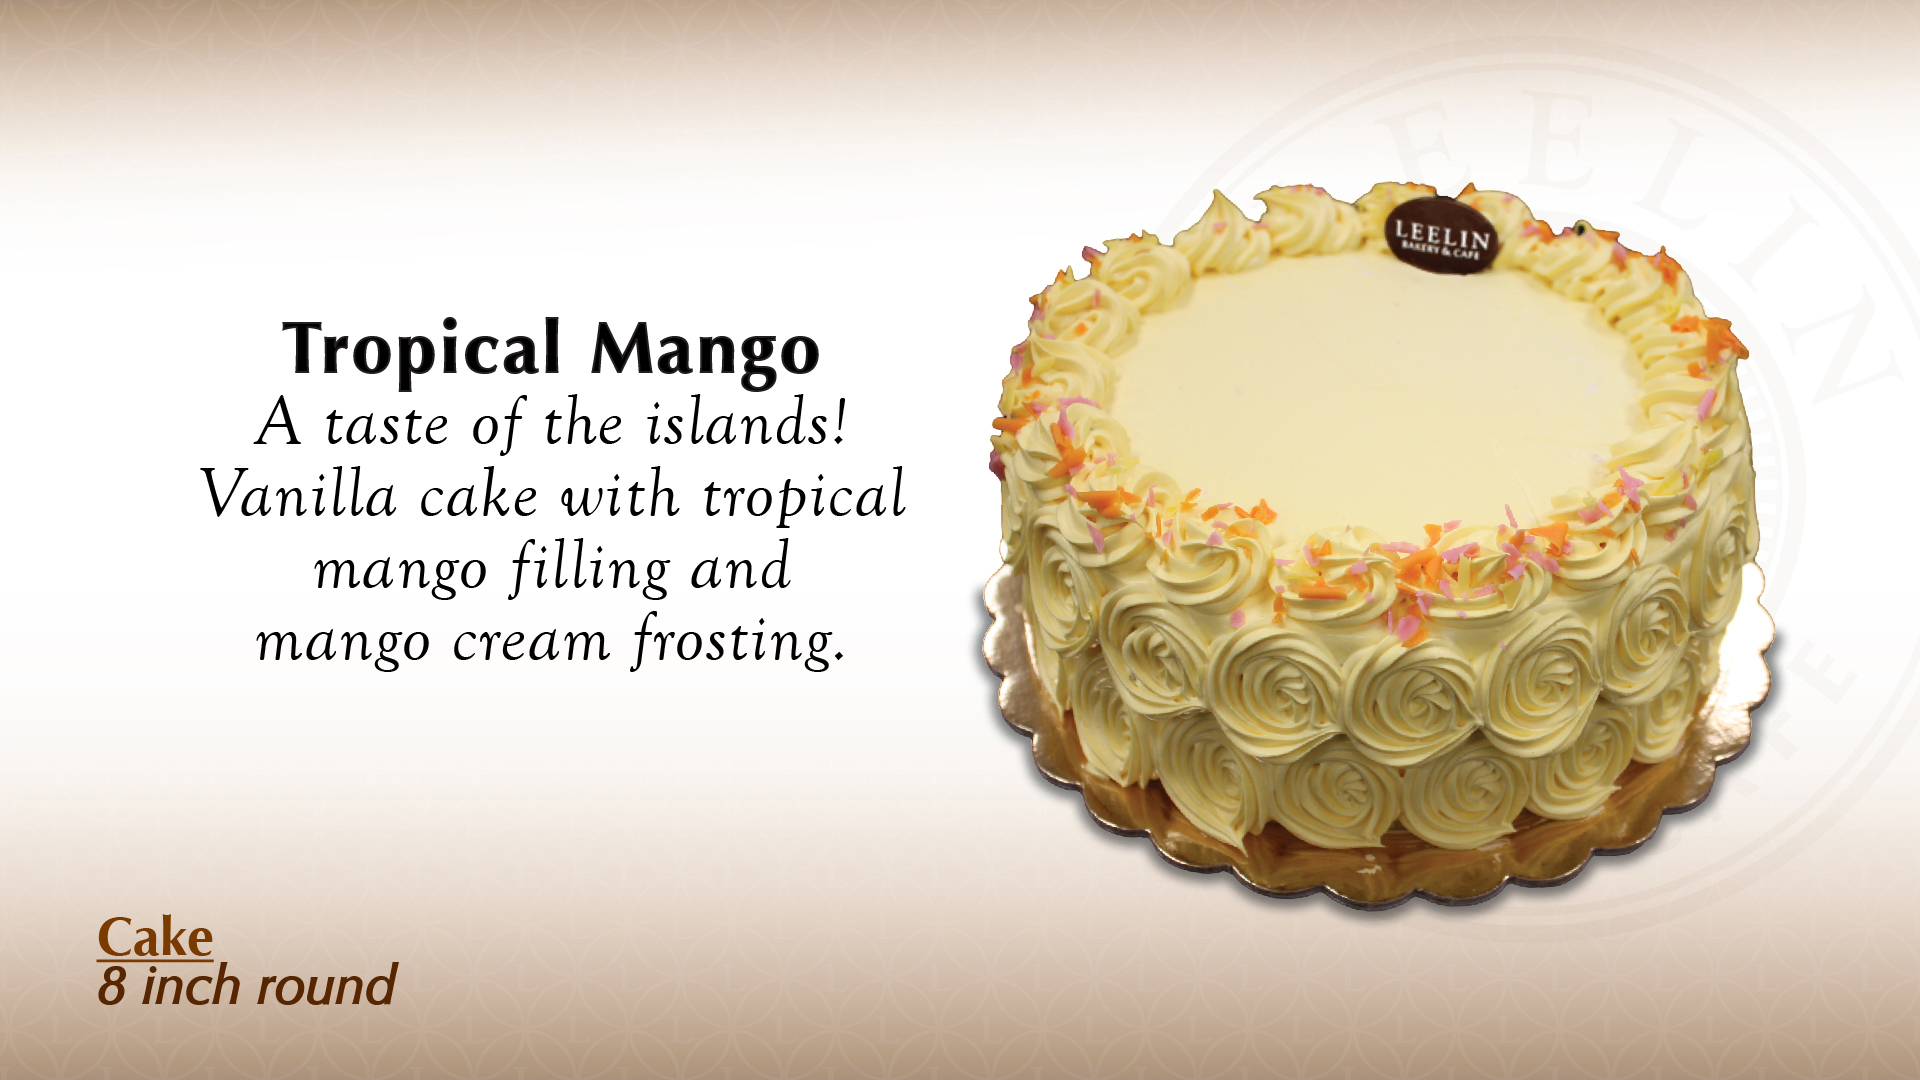 036 Tropical Mango 1920x1080.jpg